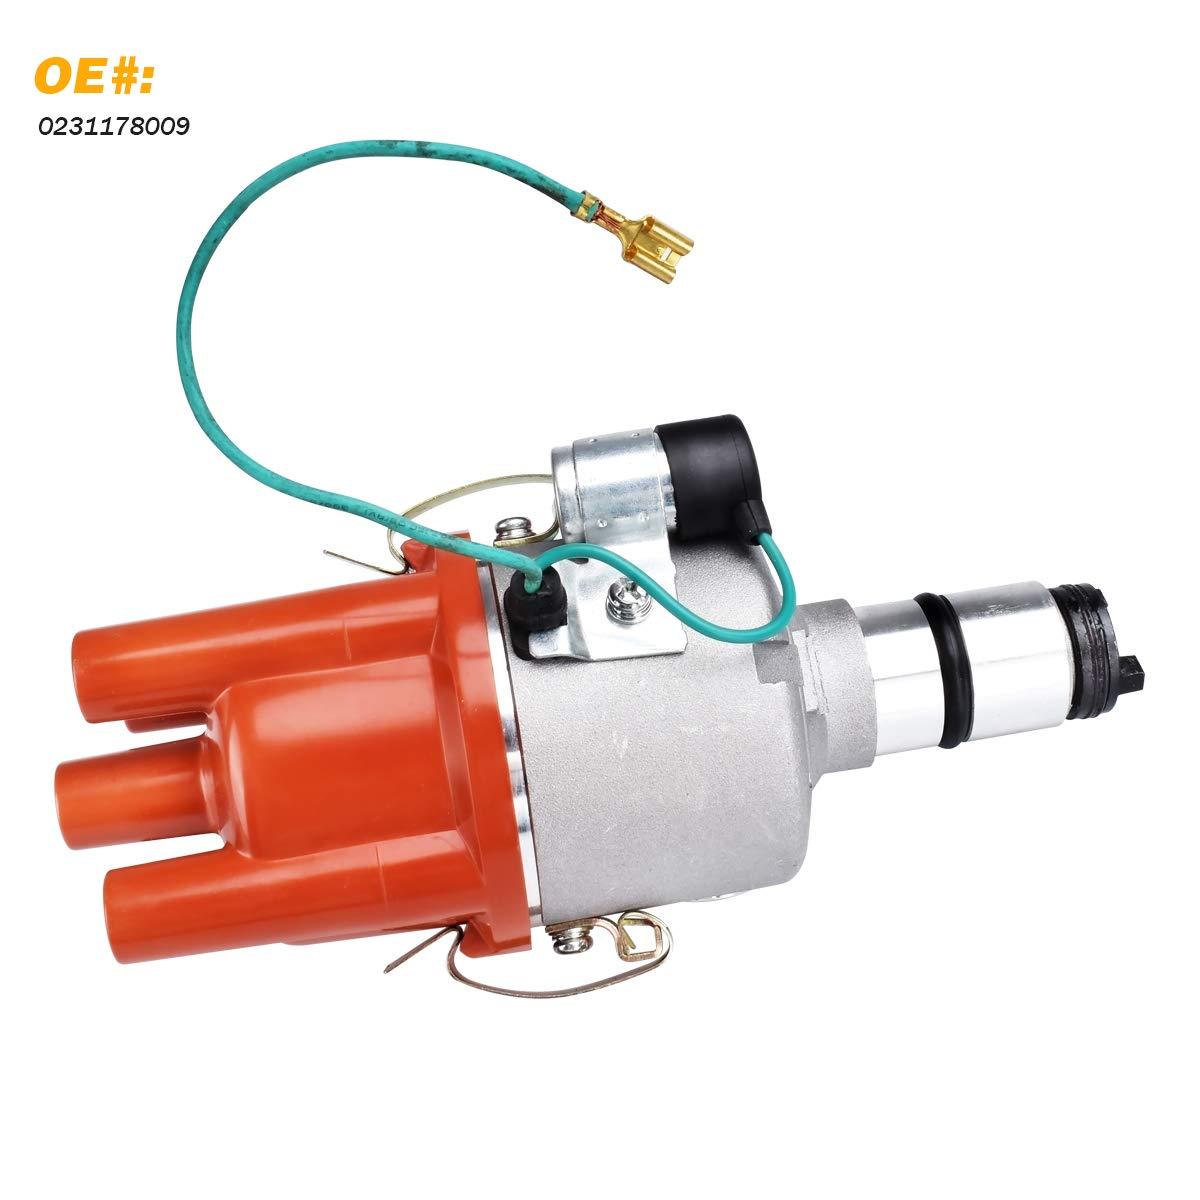 For VW BUG BUS GHIA 009 Beetle CENTRIFUGAL ADVANCE Distributor 0231178009 NEW